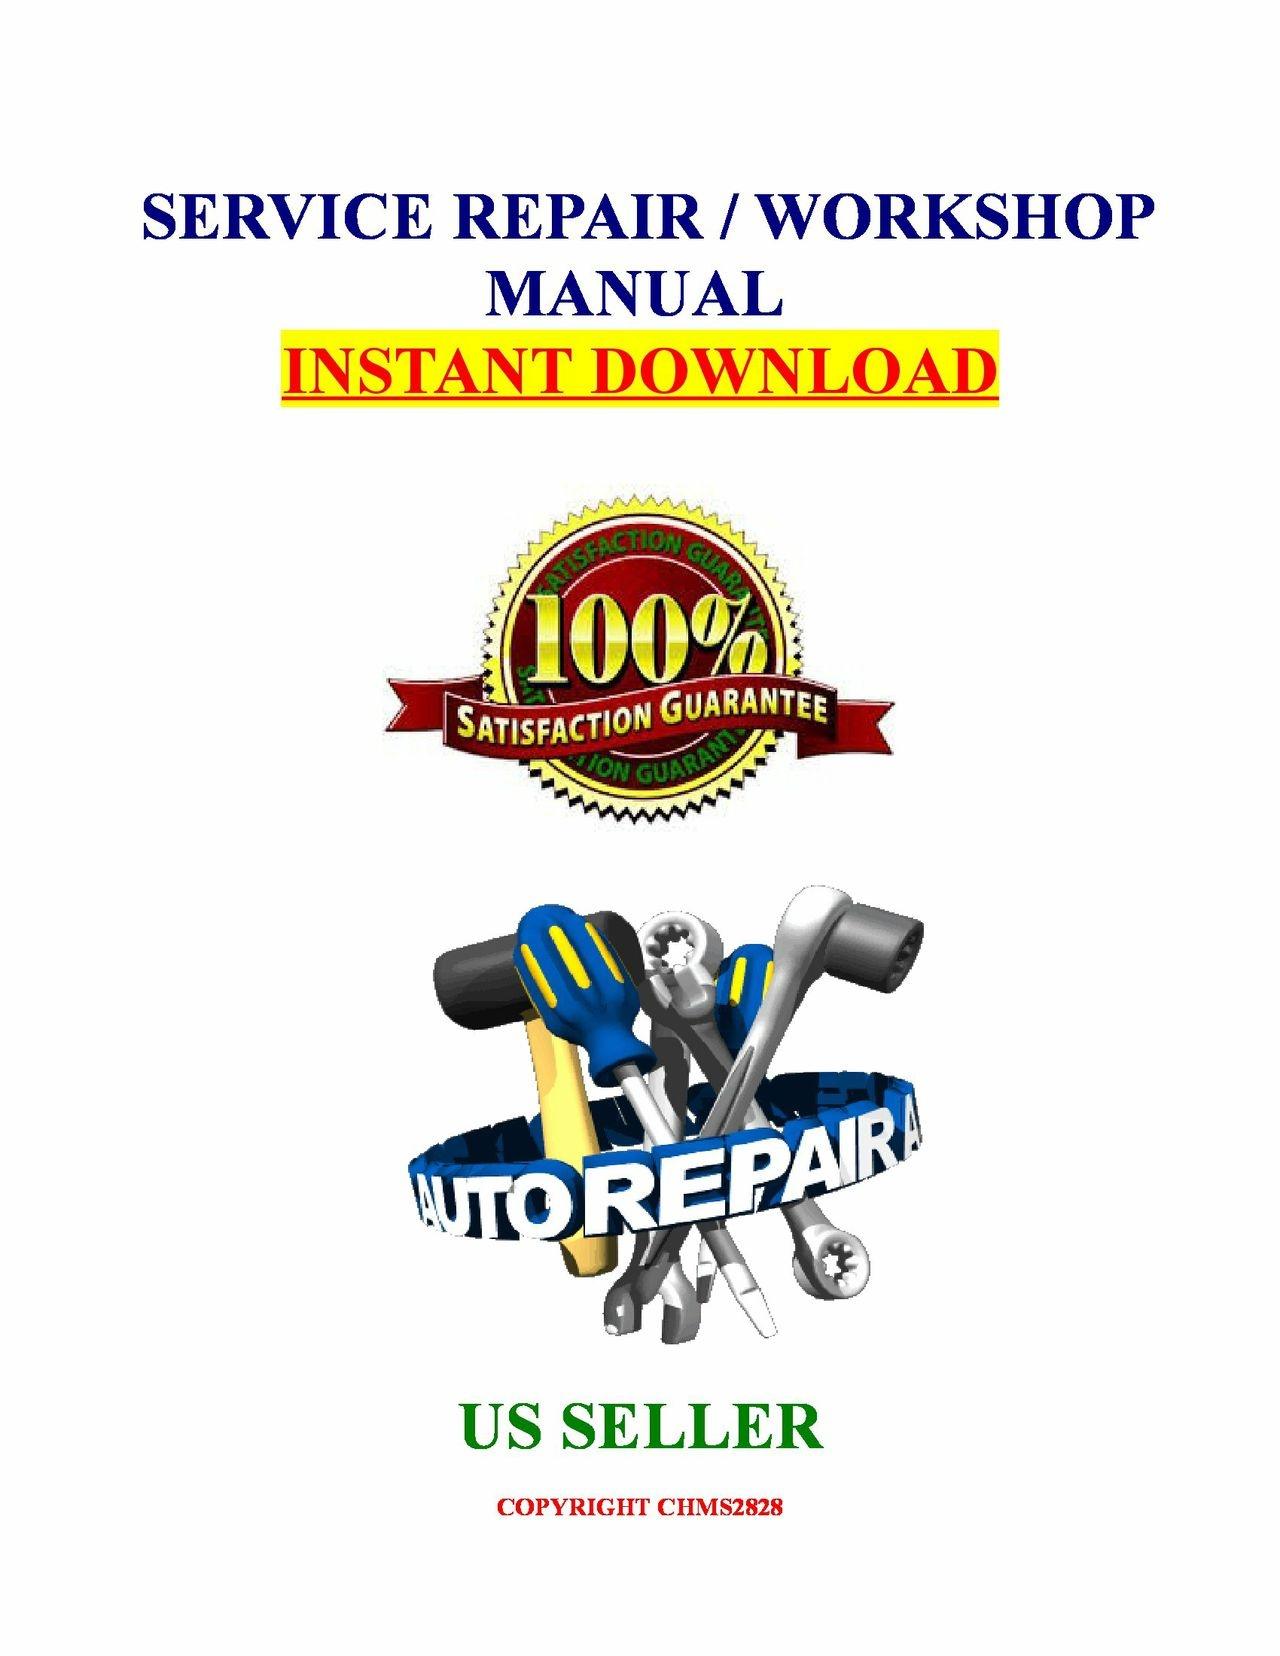 2003 Polaris Sportsman 400 500 HO ATV Service Repair Manual